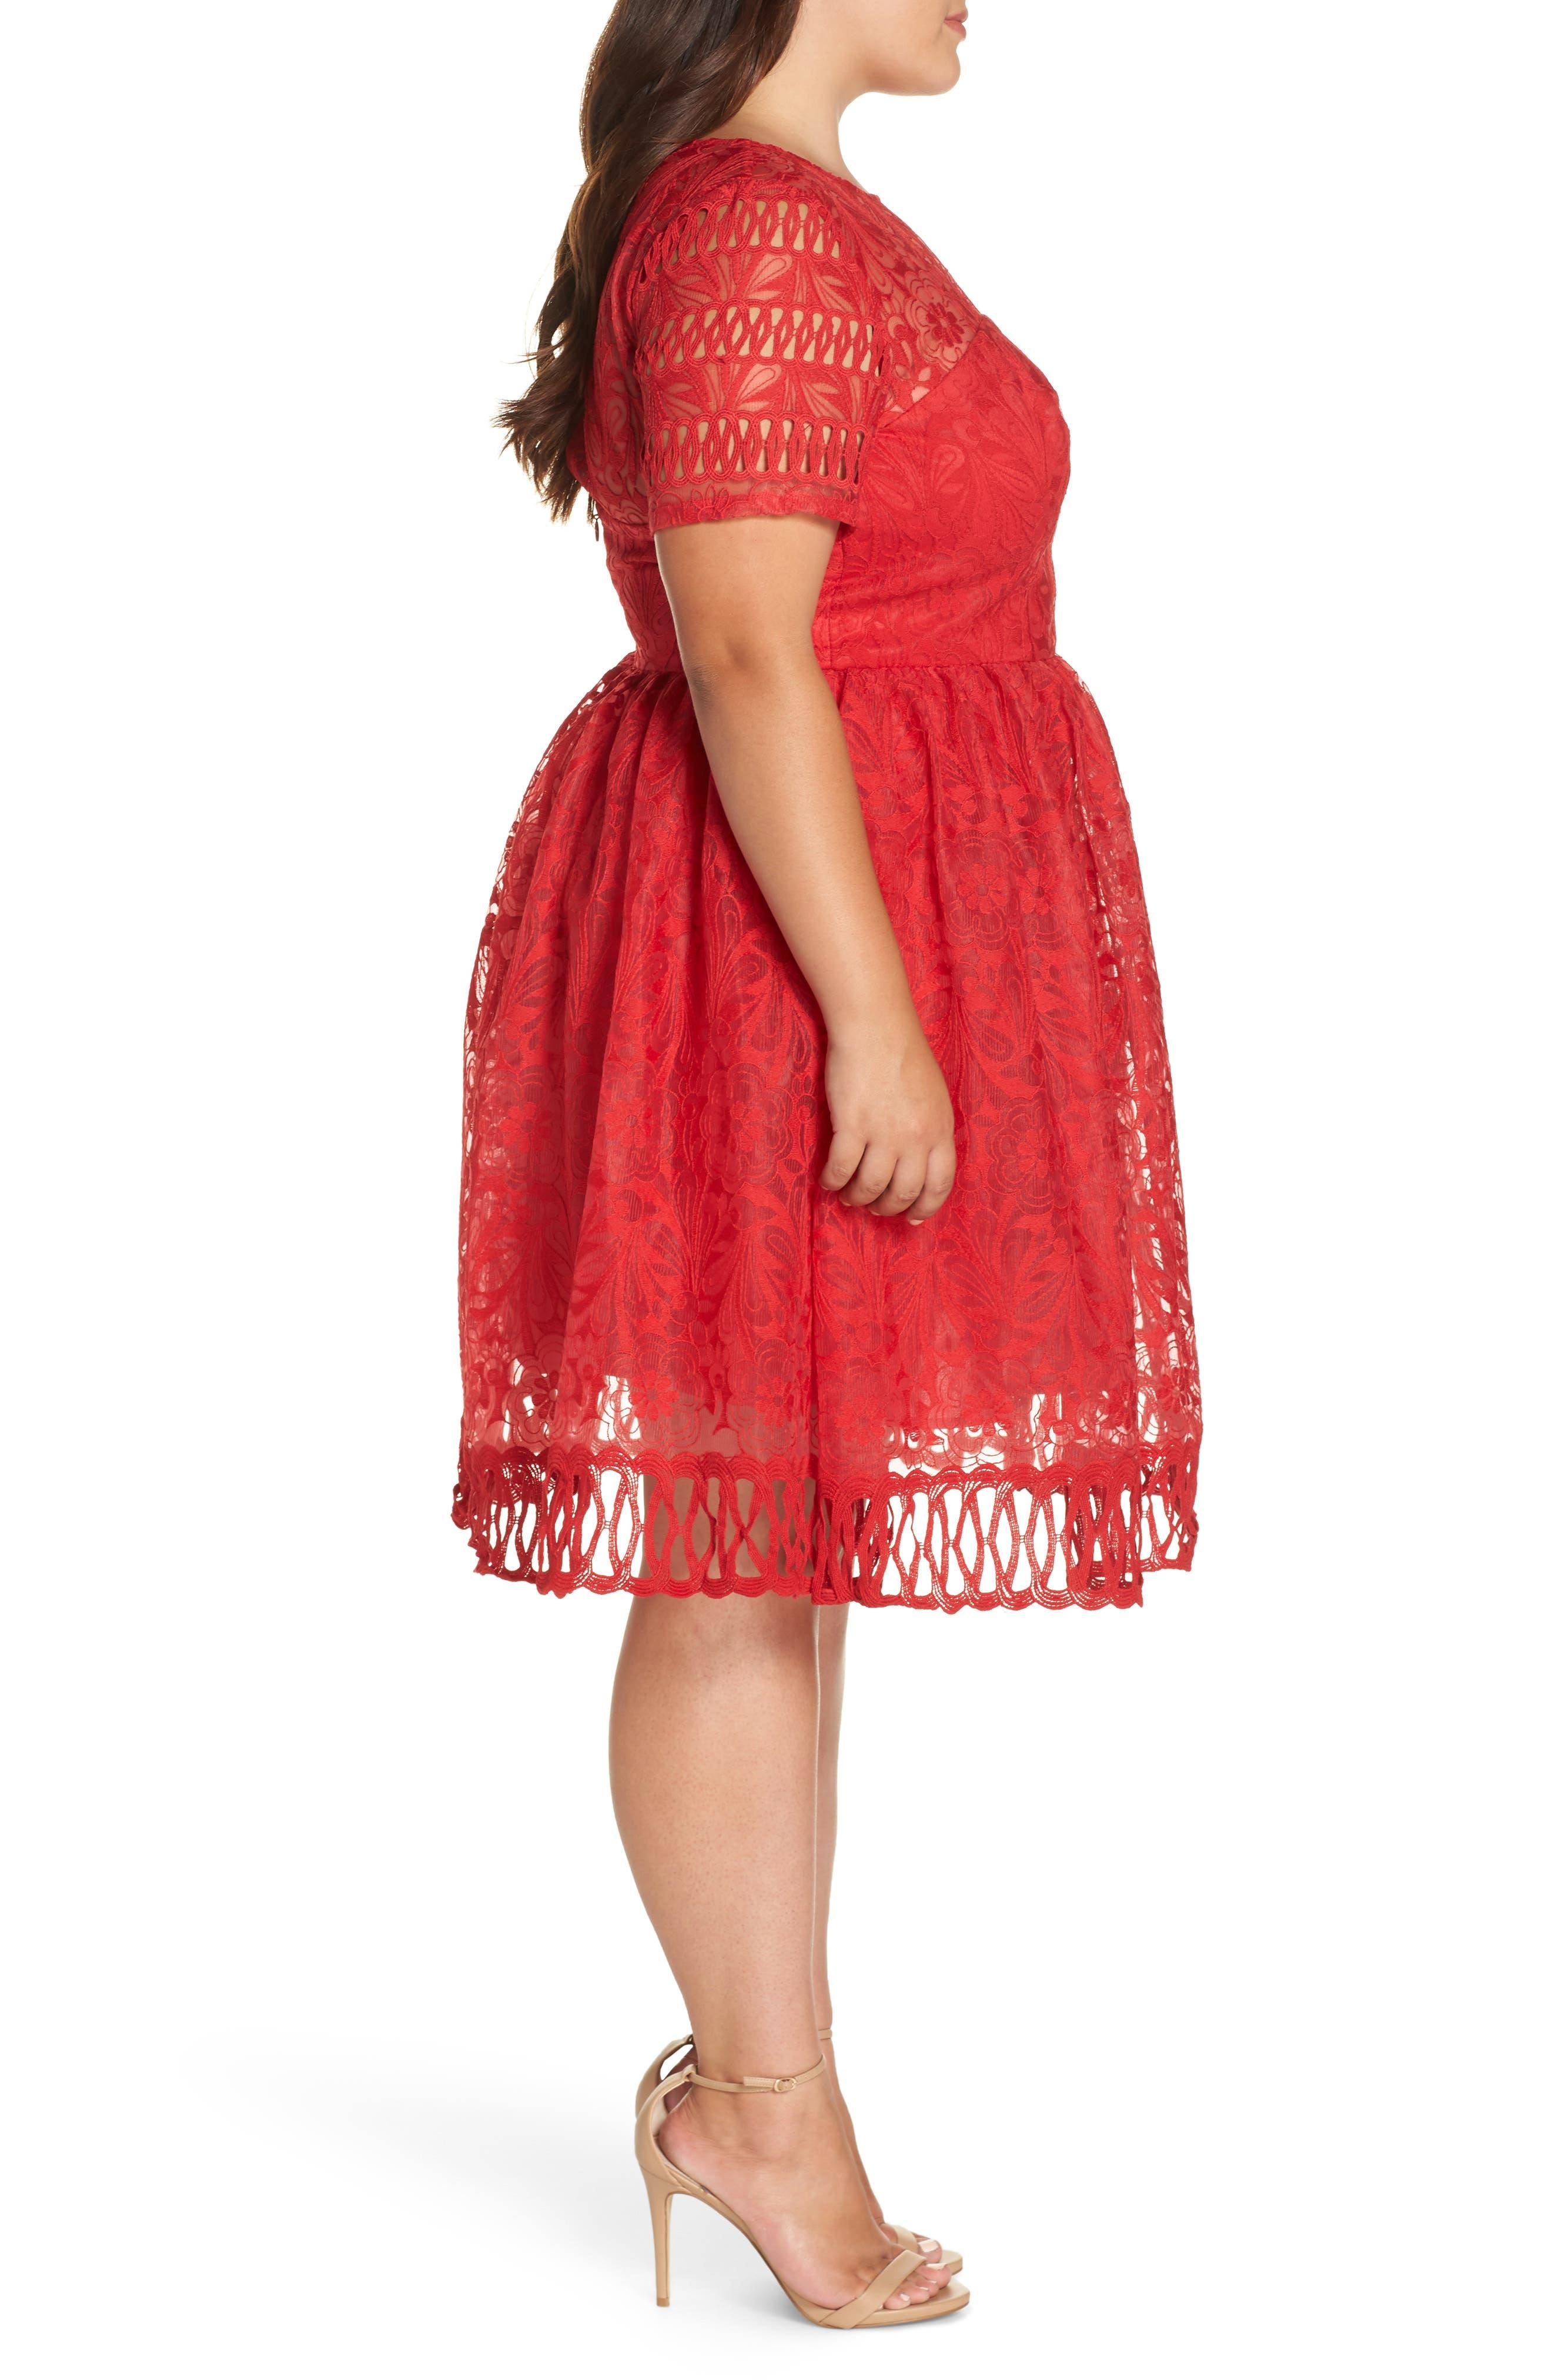 CHI CHI LONDON, Crochet Dress, Alternate thumbnail 4, color, RED